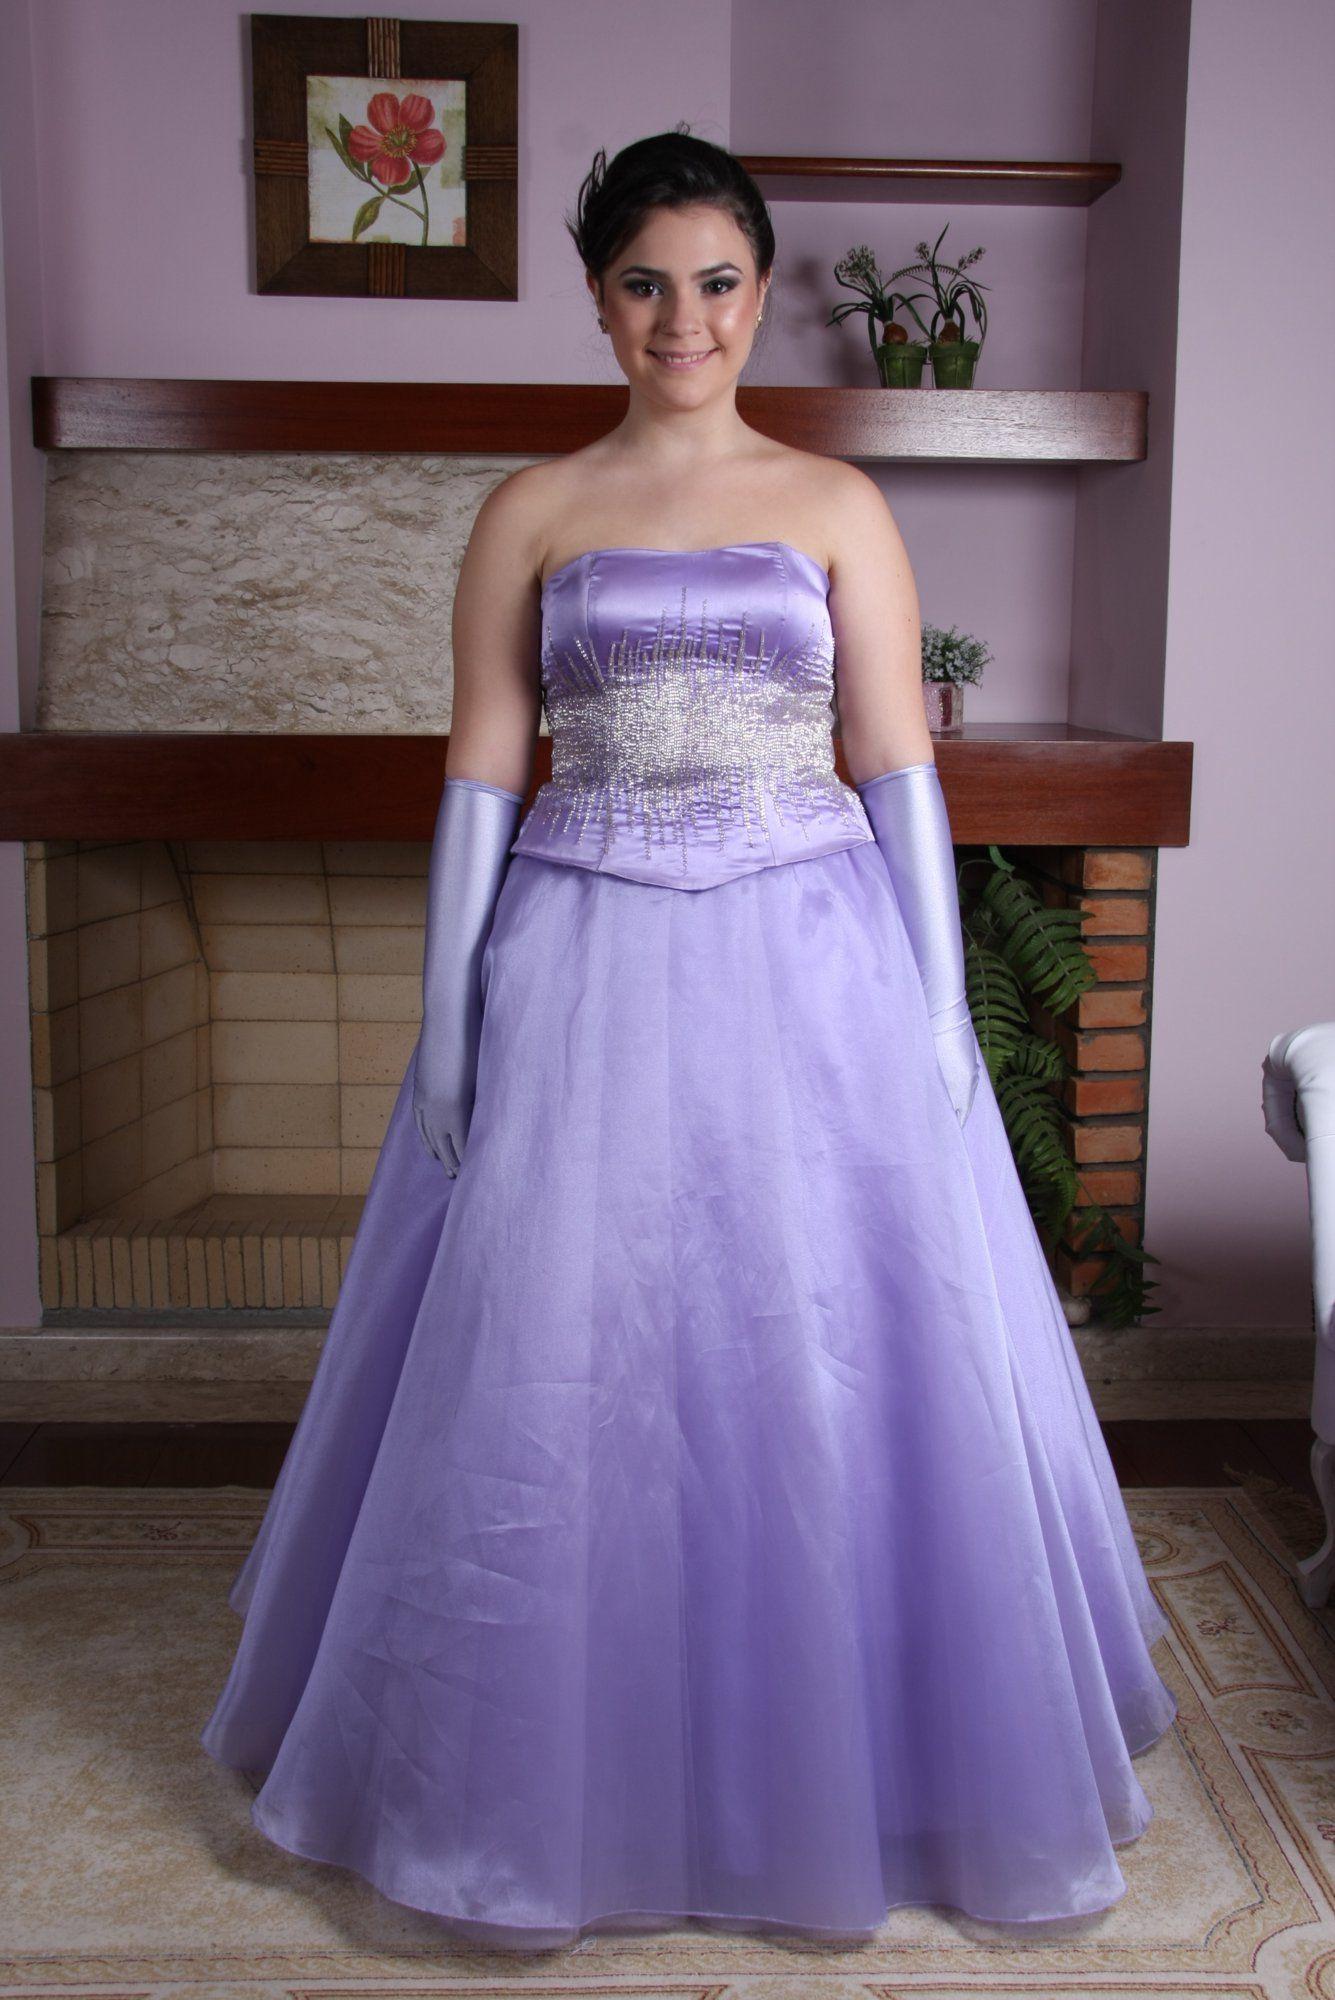 Vestido de Debutante Lilas - 9 - Hipnose Alta Costura e Spa para Noivas e Noivos - Campinas - SP Vestido de Debutante, Vestido de Debutante Lilas, Hipnose Alta Costura